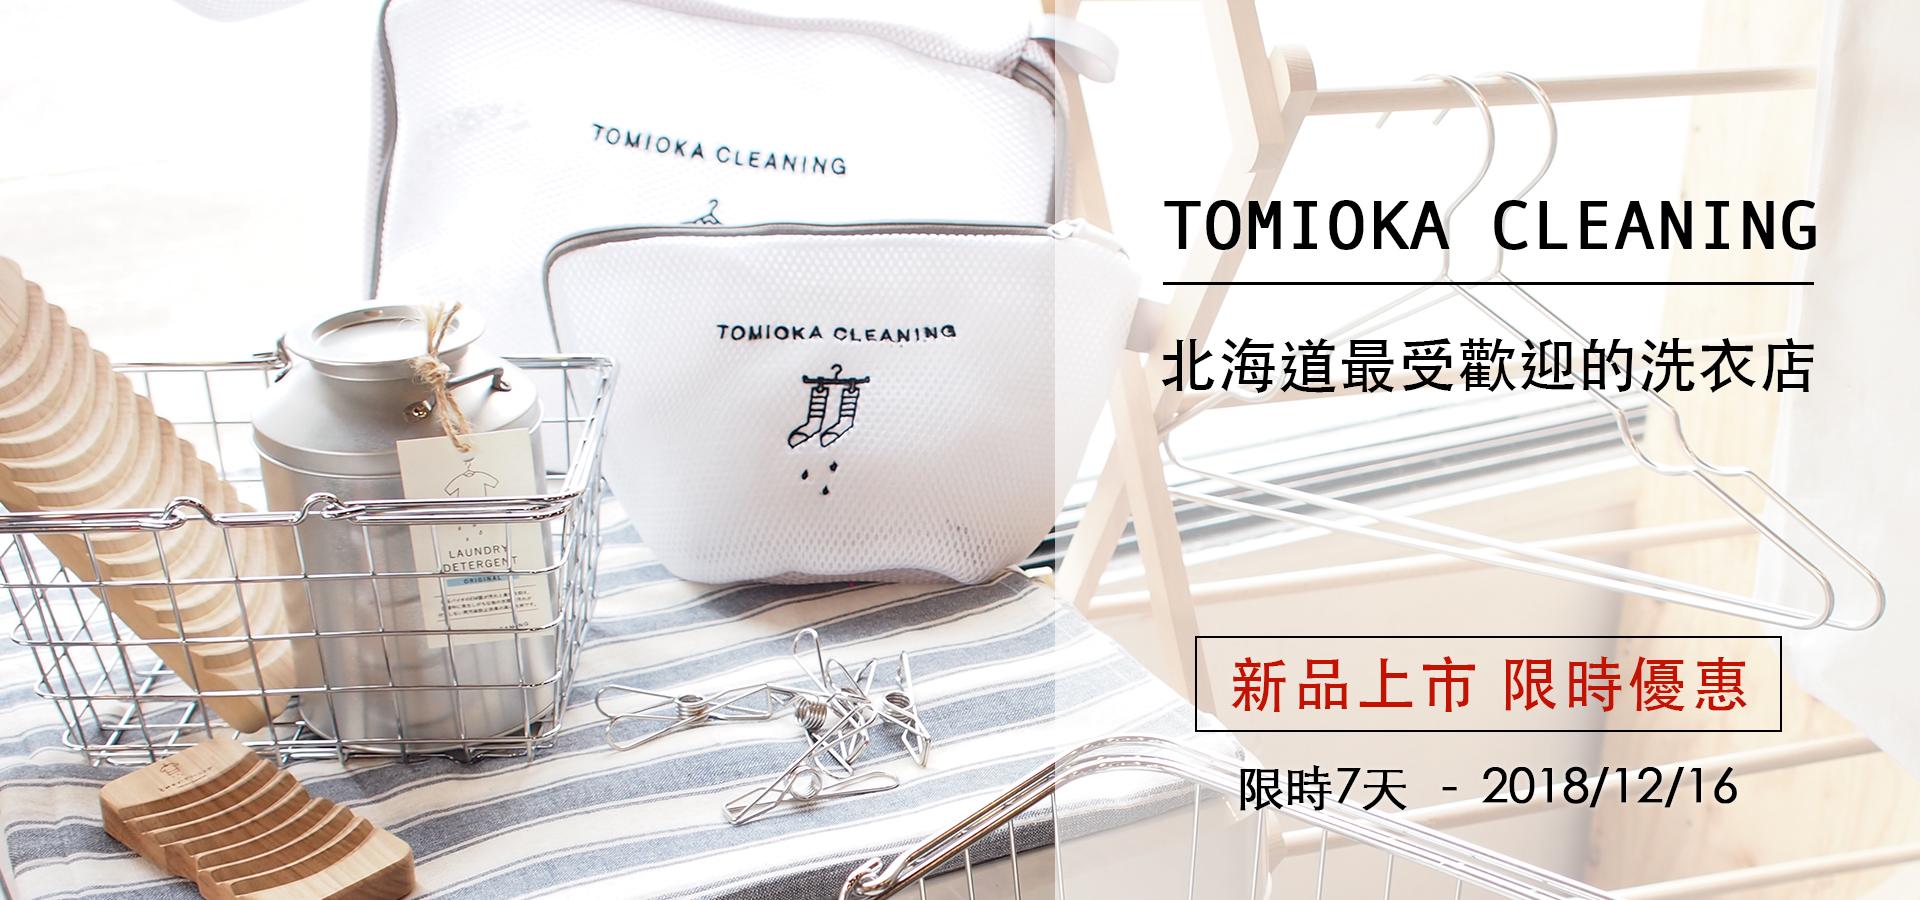 TOMIOKA CLEANING北海道原創洗衣品牌新品上市限時優惠